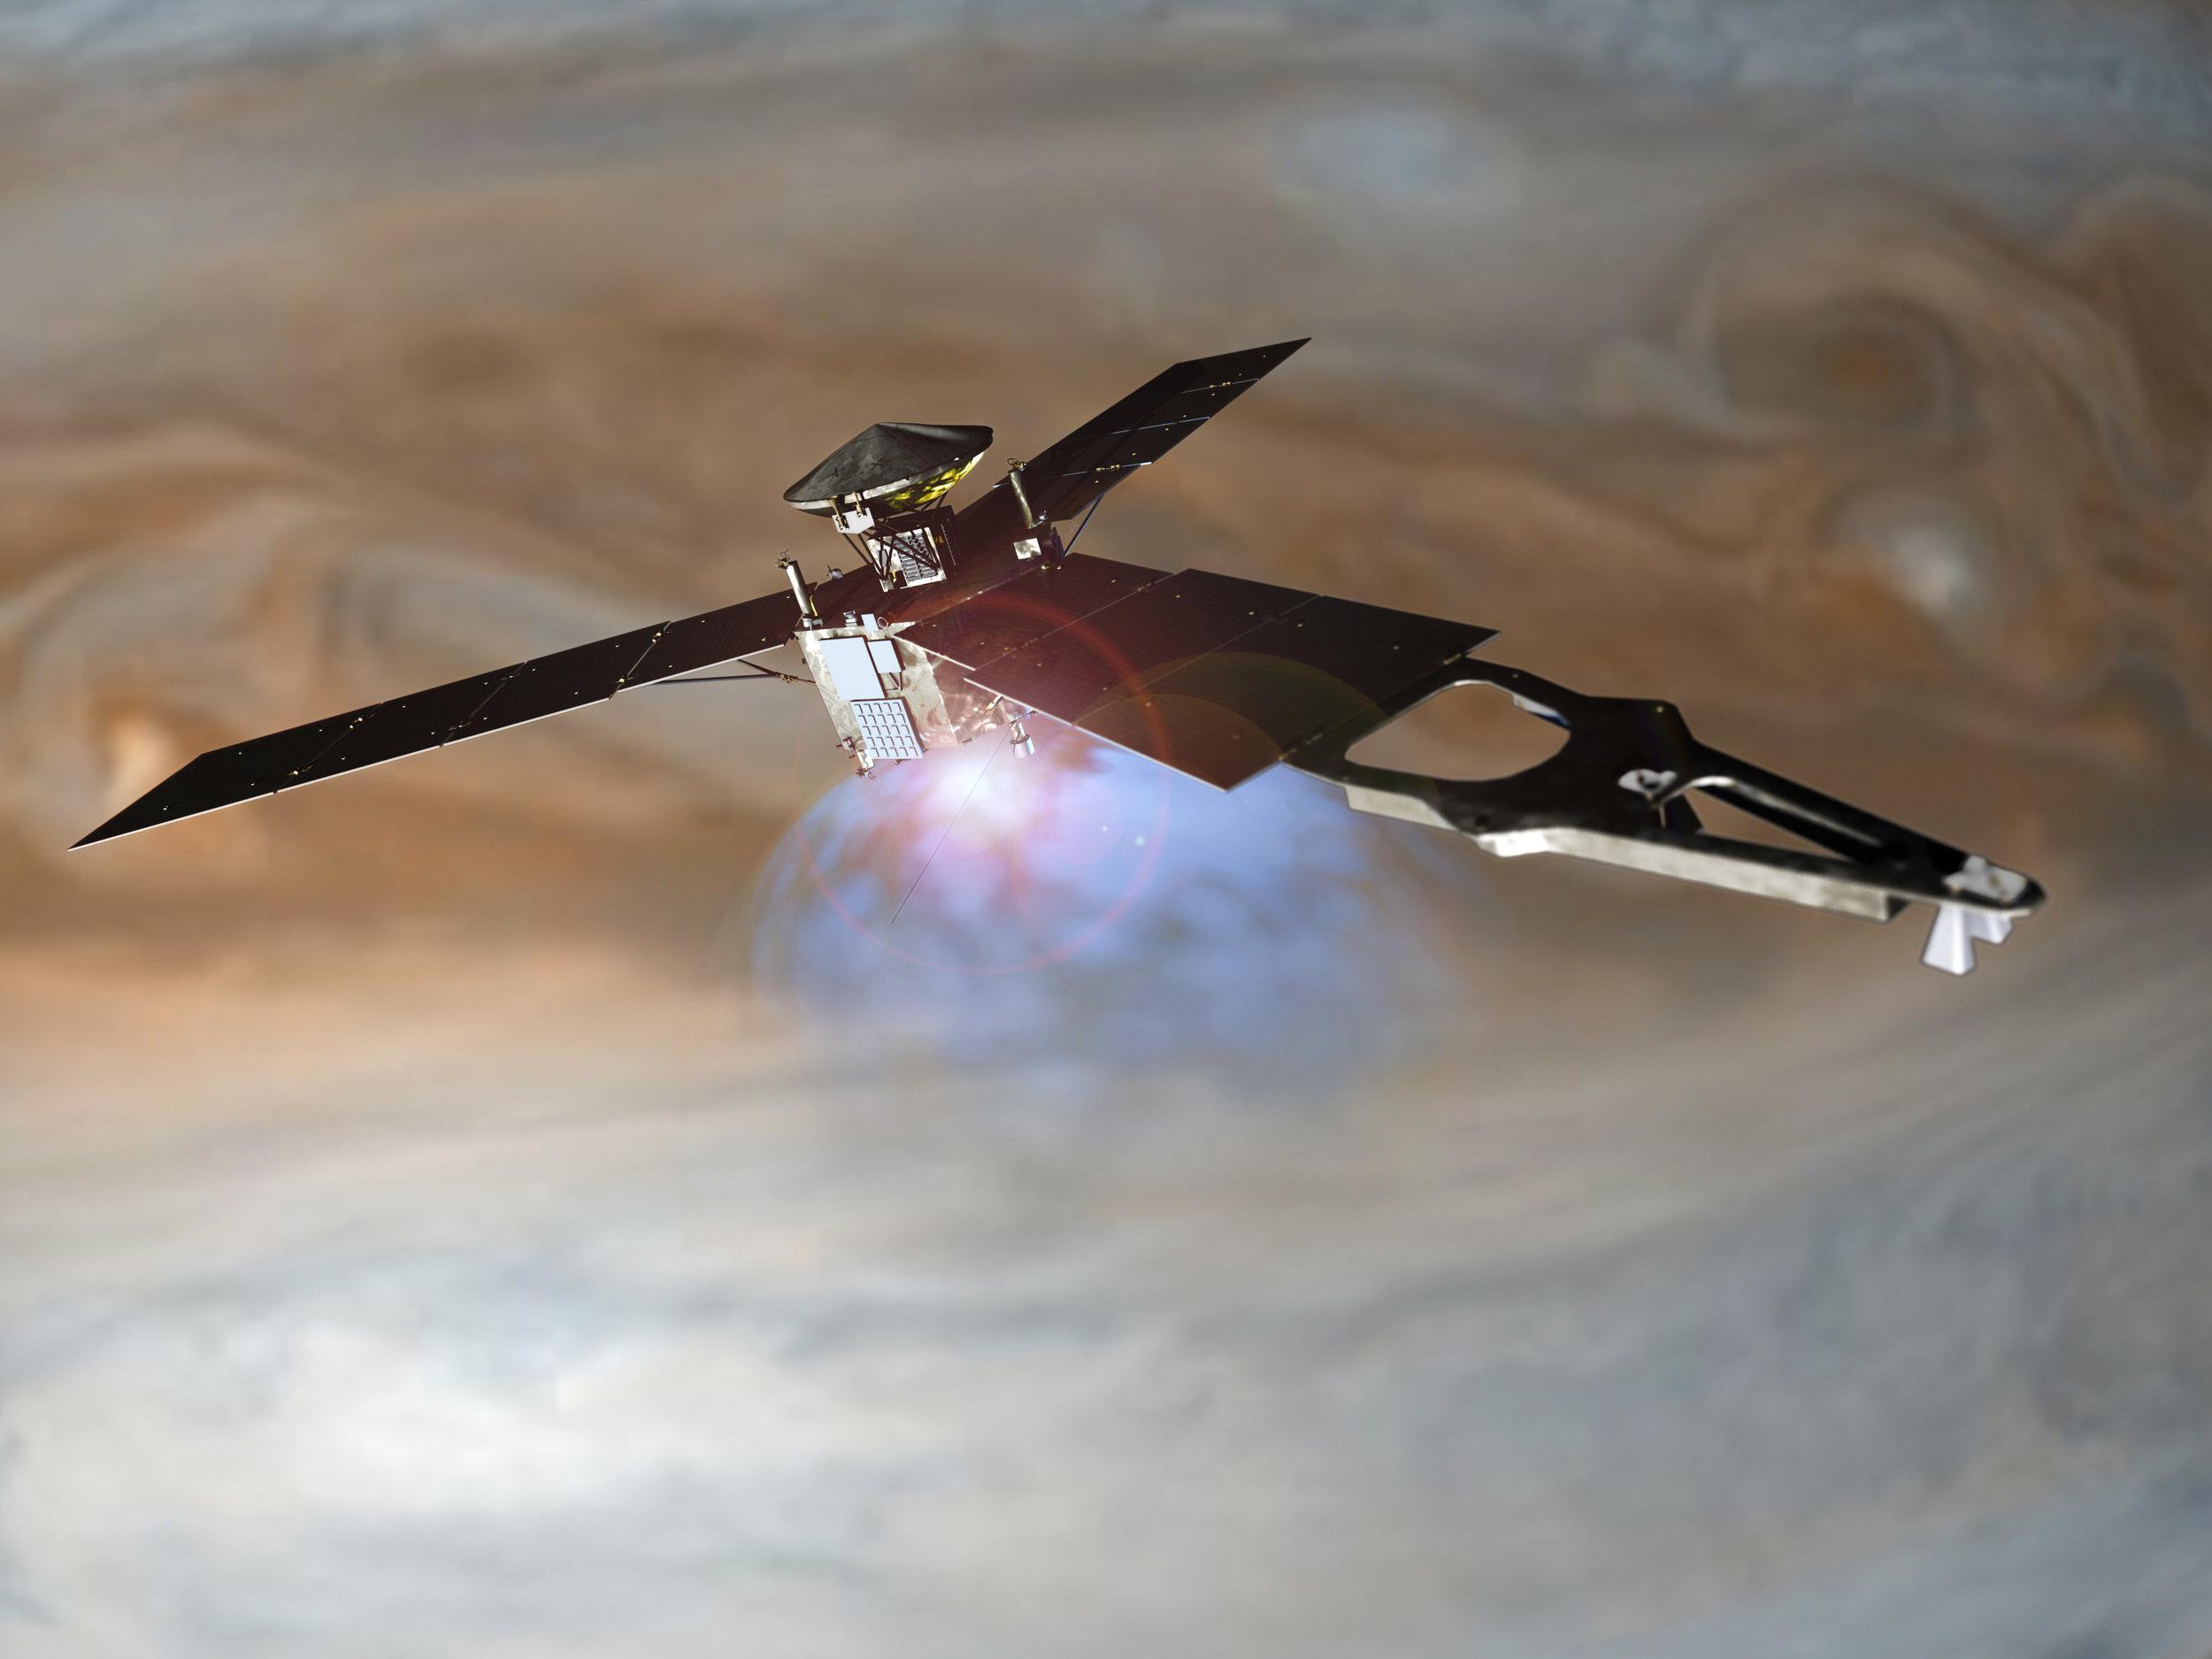 Illustration of NASA's Juno spacecraft firing its main engine to slow down and go into orbit around Jupiter. Lockheed Martin built the Juno spacecraft for NASA's Jet Propulsion Laboratory. Image Credit: NASA/Lockheed Martin